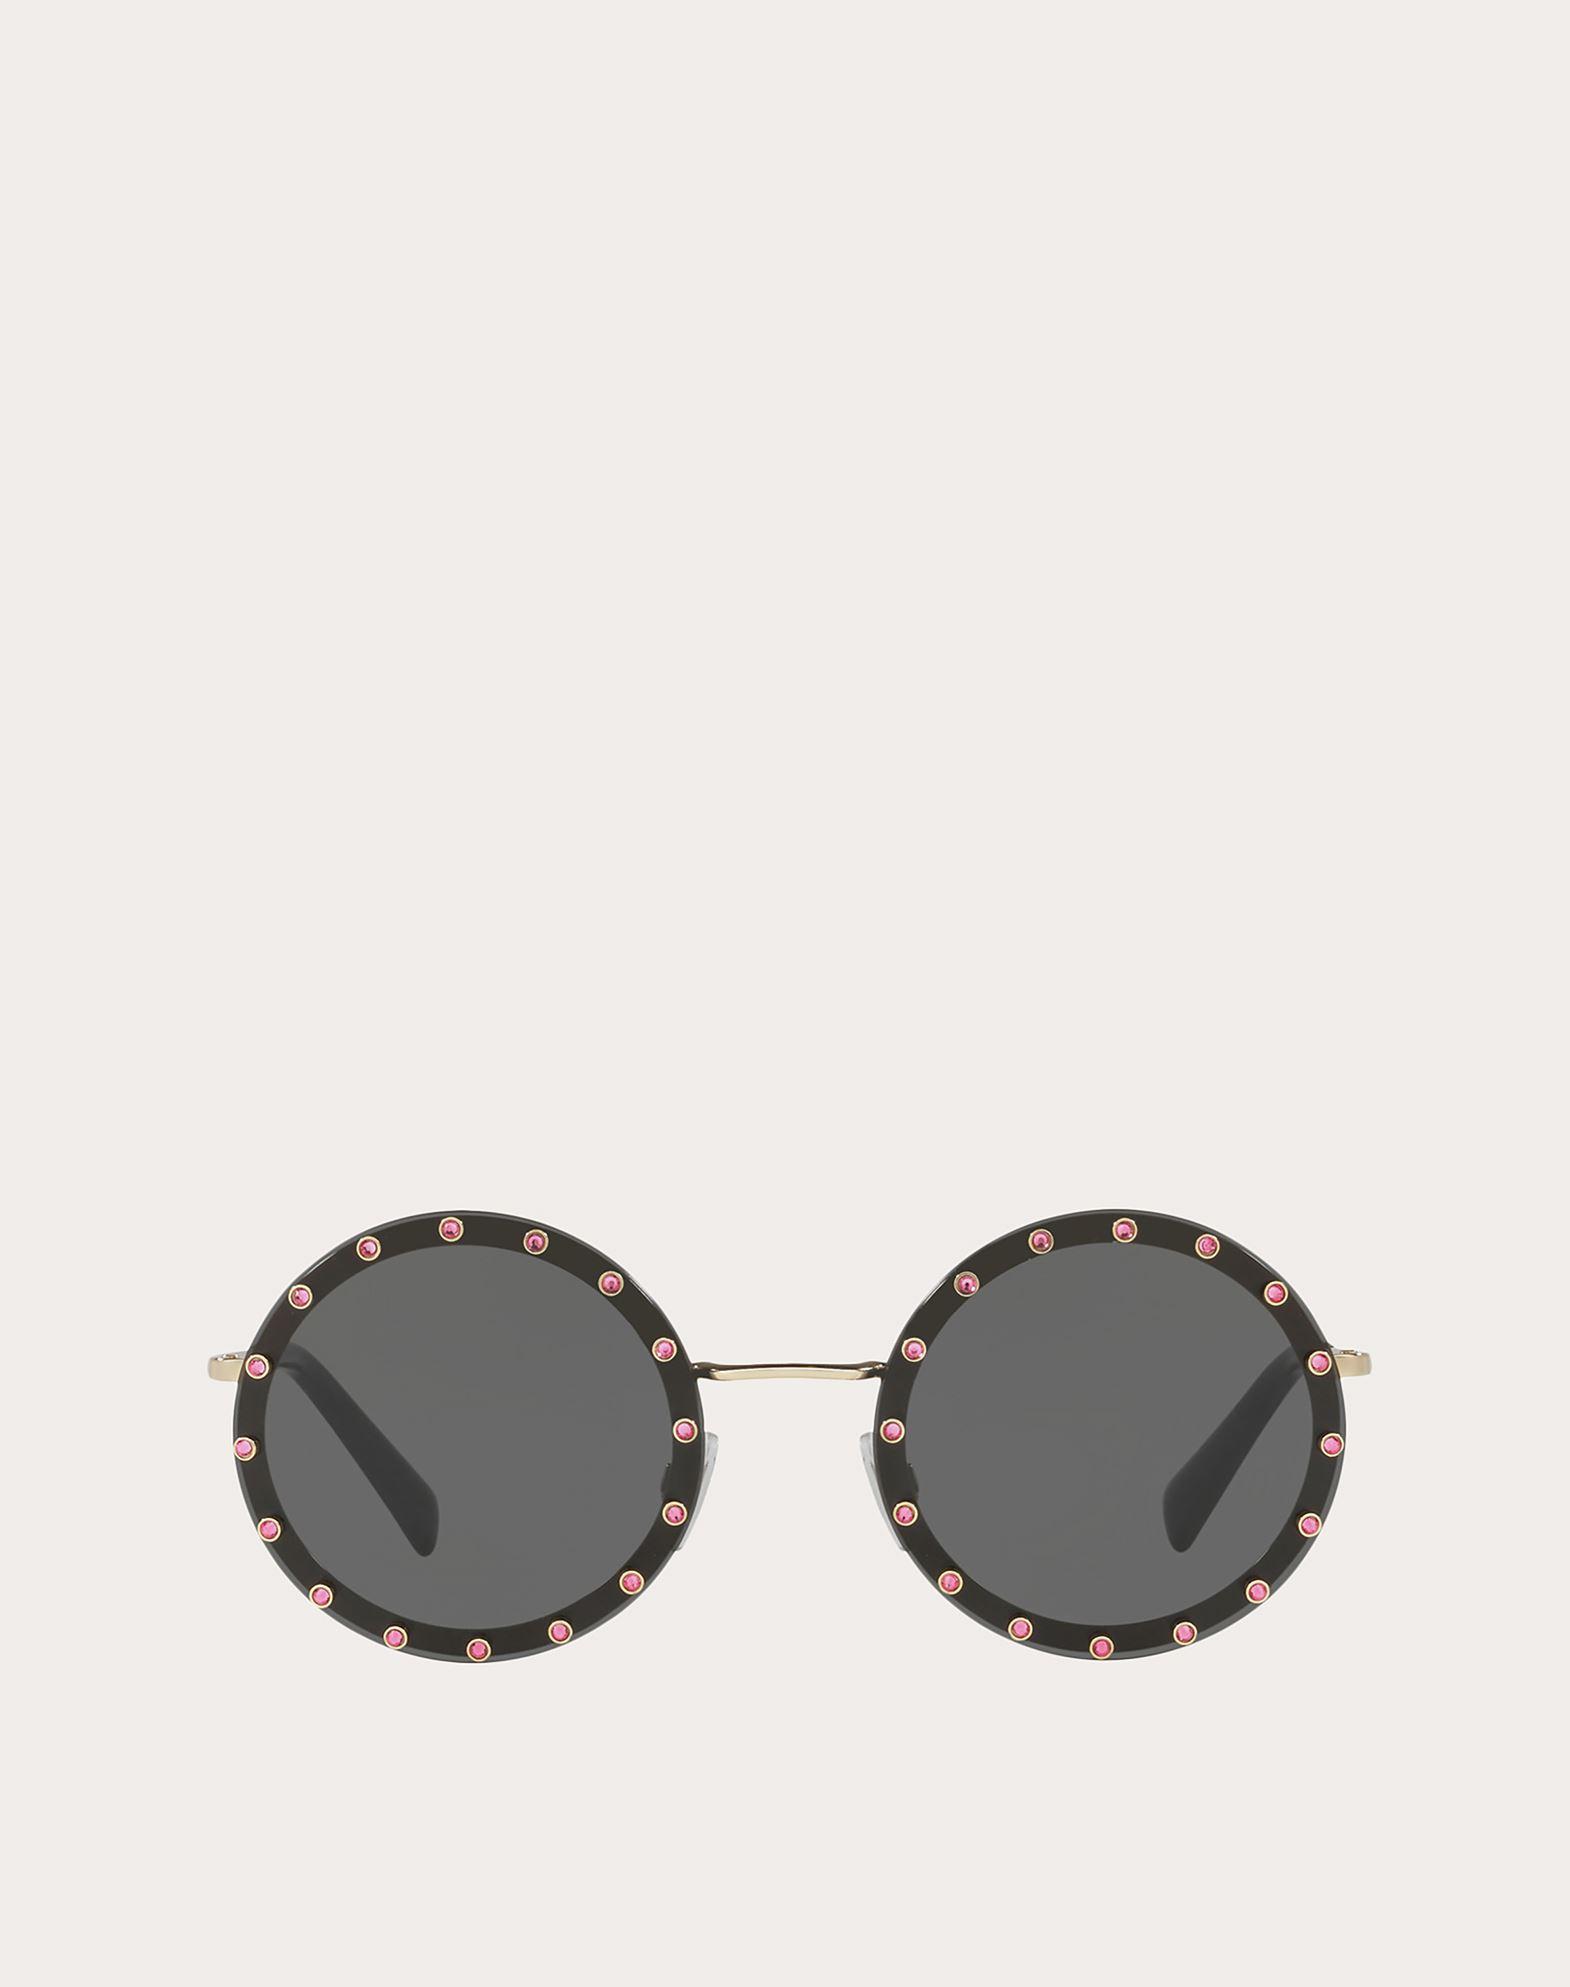 VALENTINO OCCHIALI Metal Sunglasses Sunglasses D f